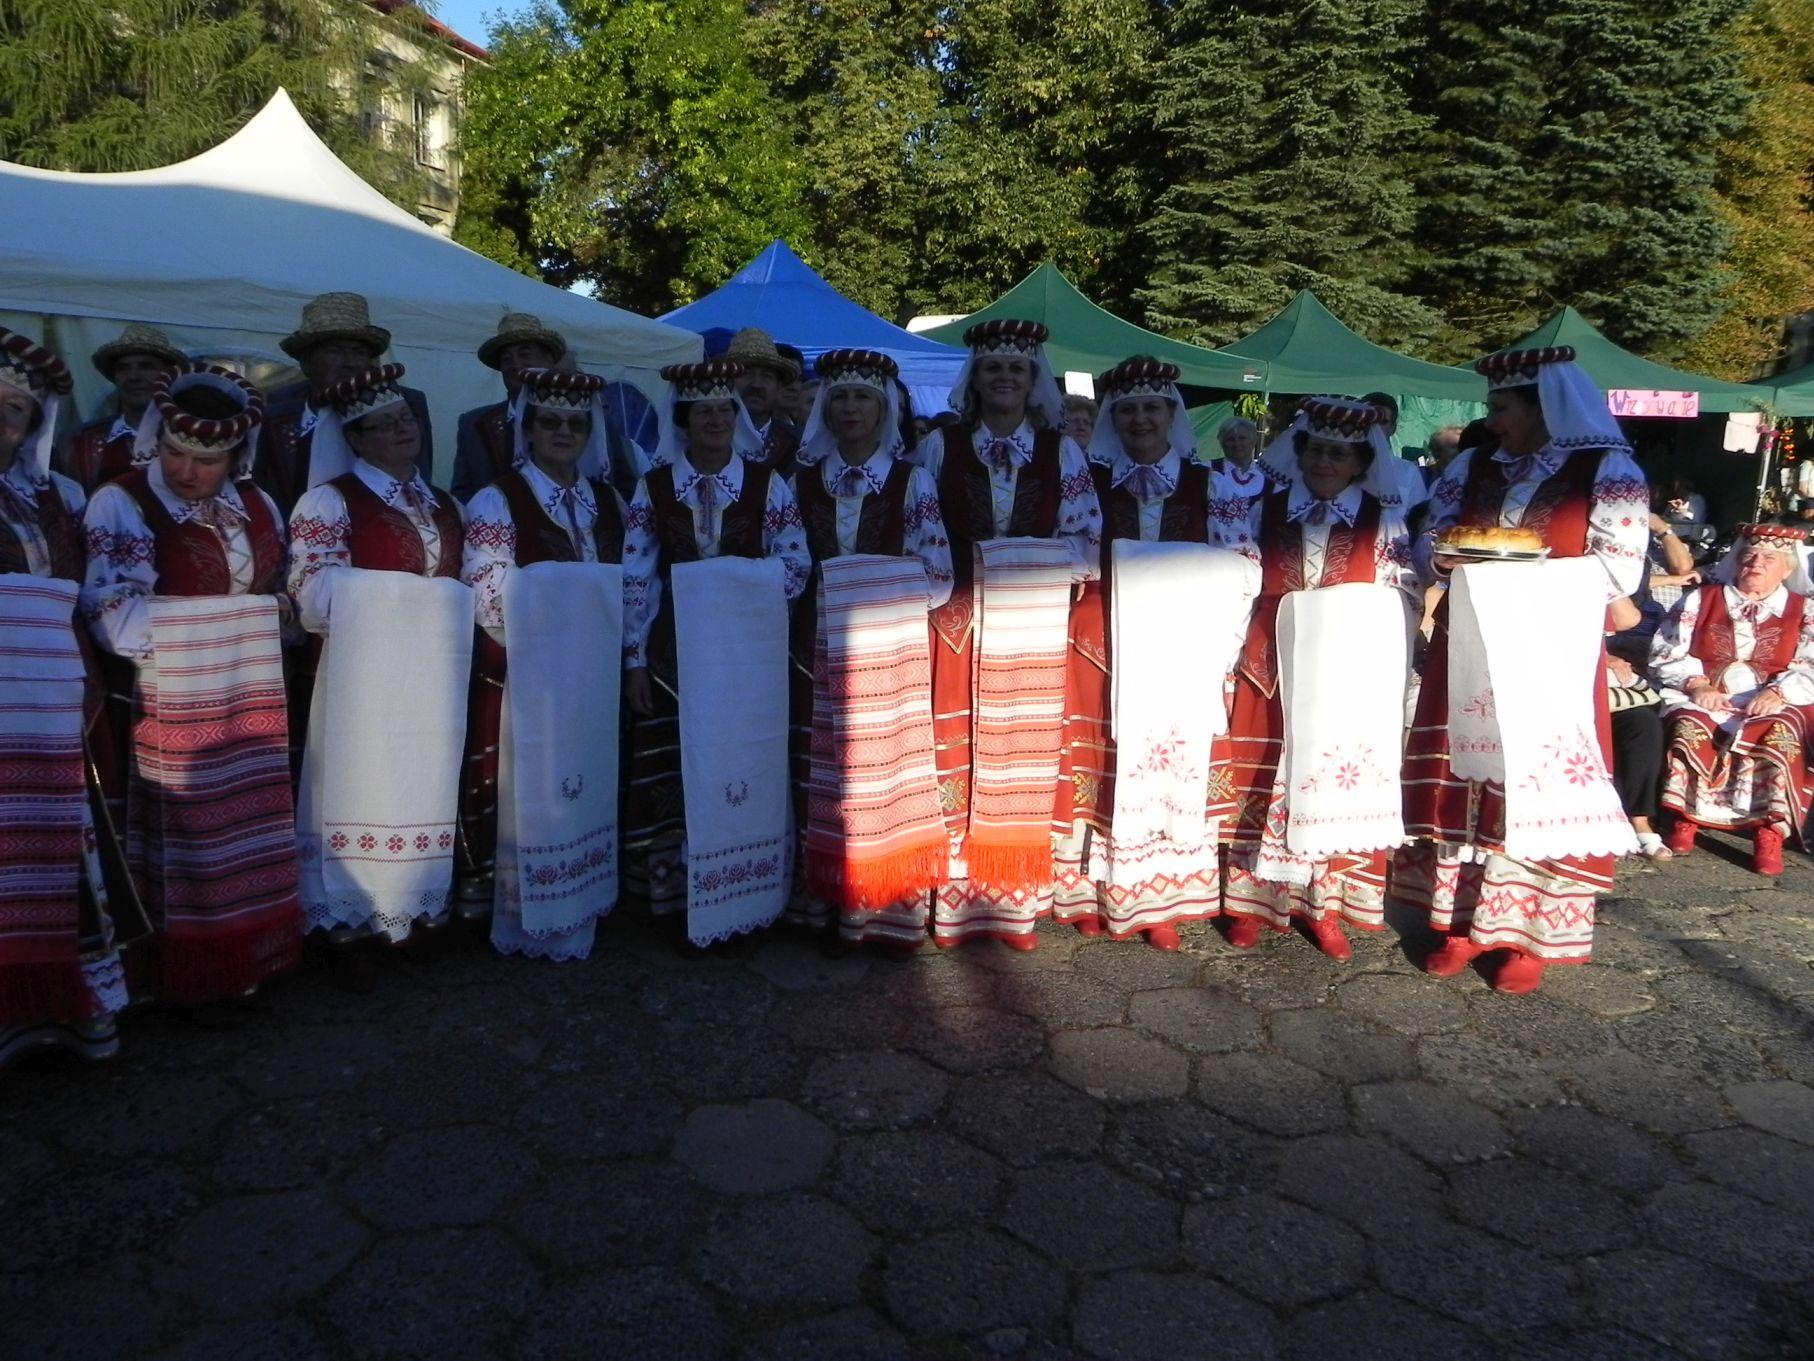 2013-09-10 Festyn - Mińsk Maz (109)